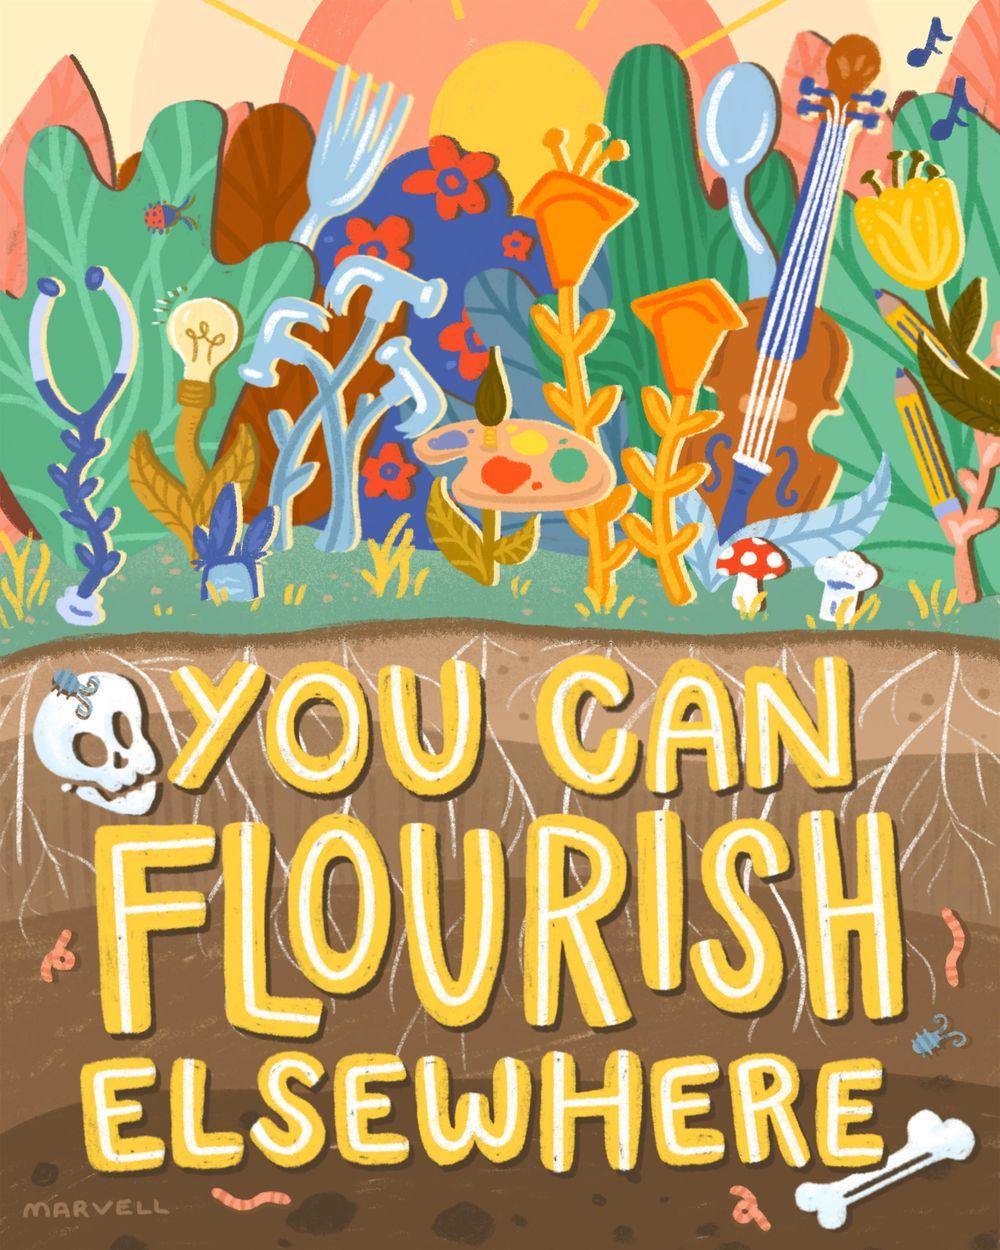 Keep Flourishing - image 1 - student project